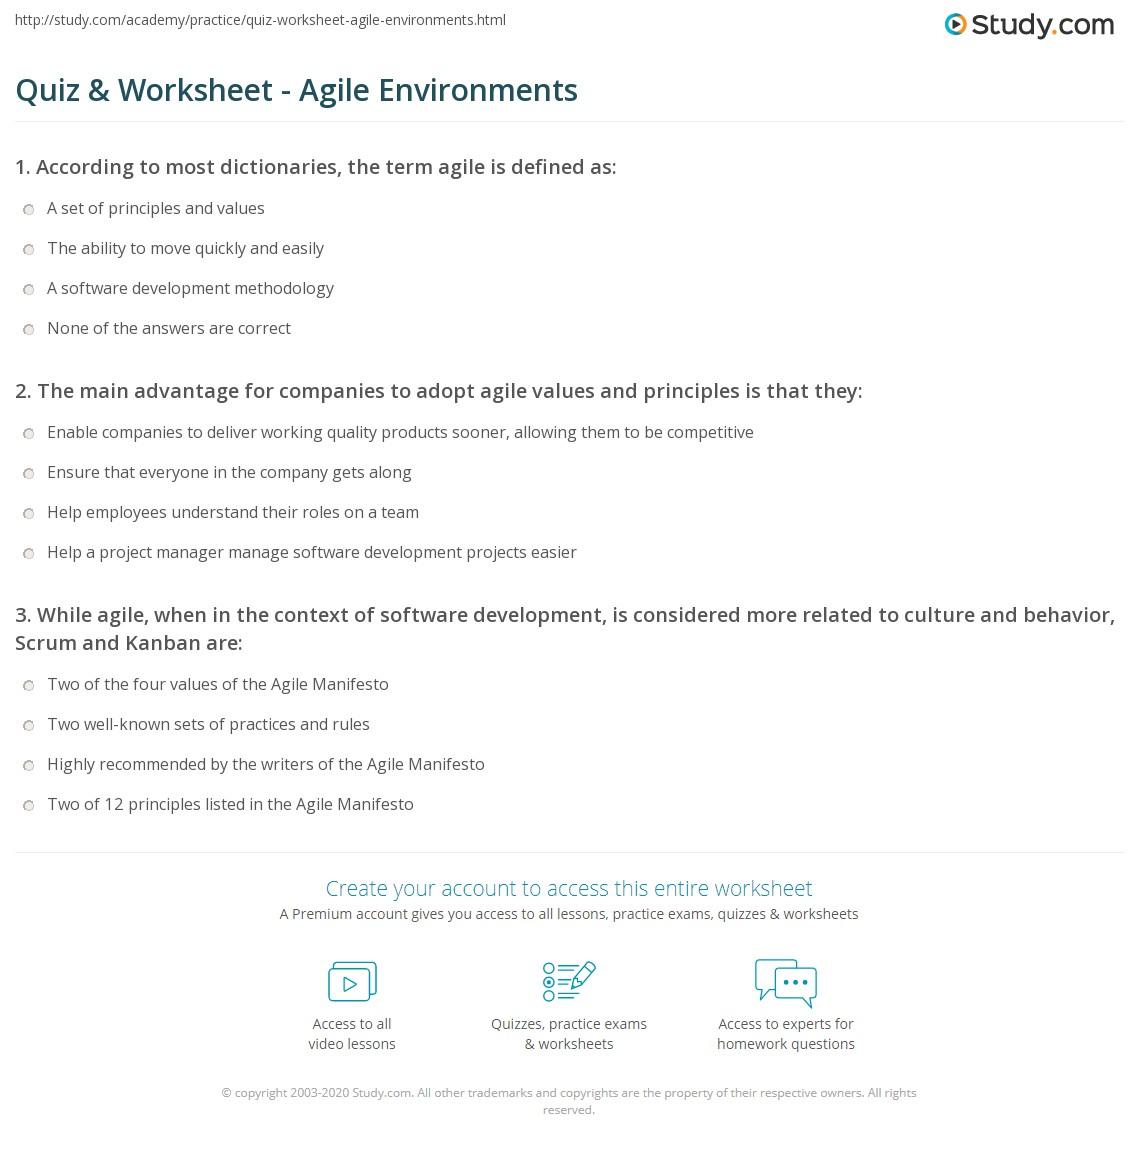 Quiz & Worksheet - Agile Environments   Study.com